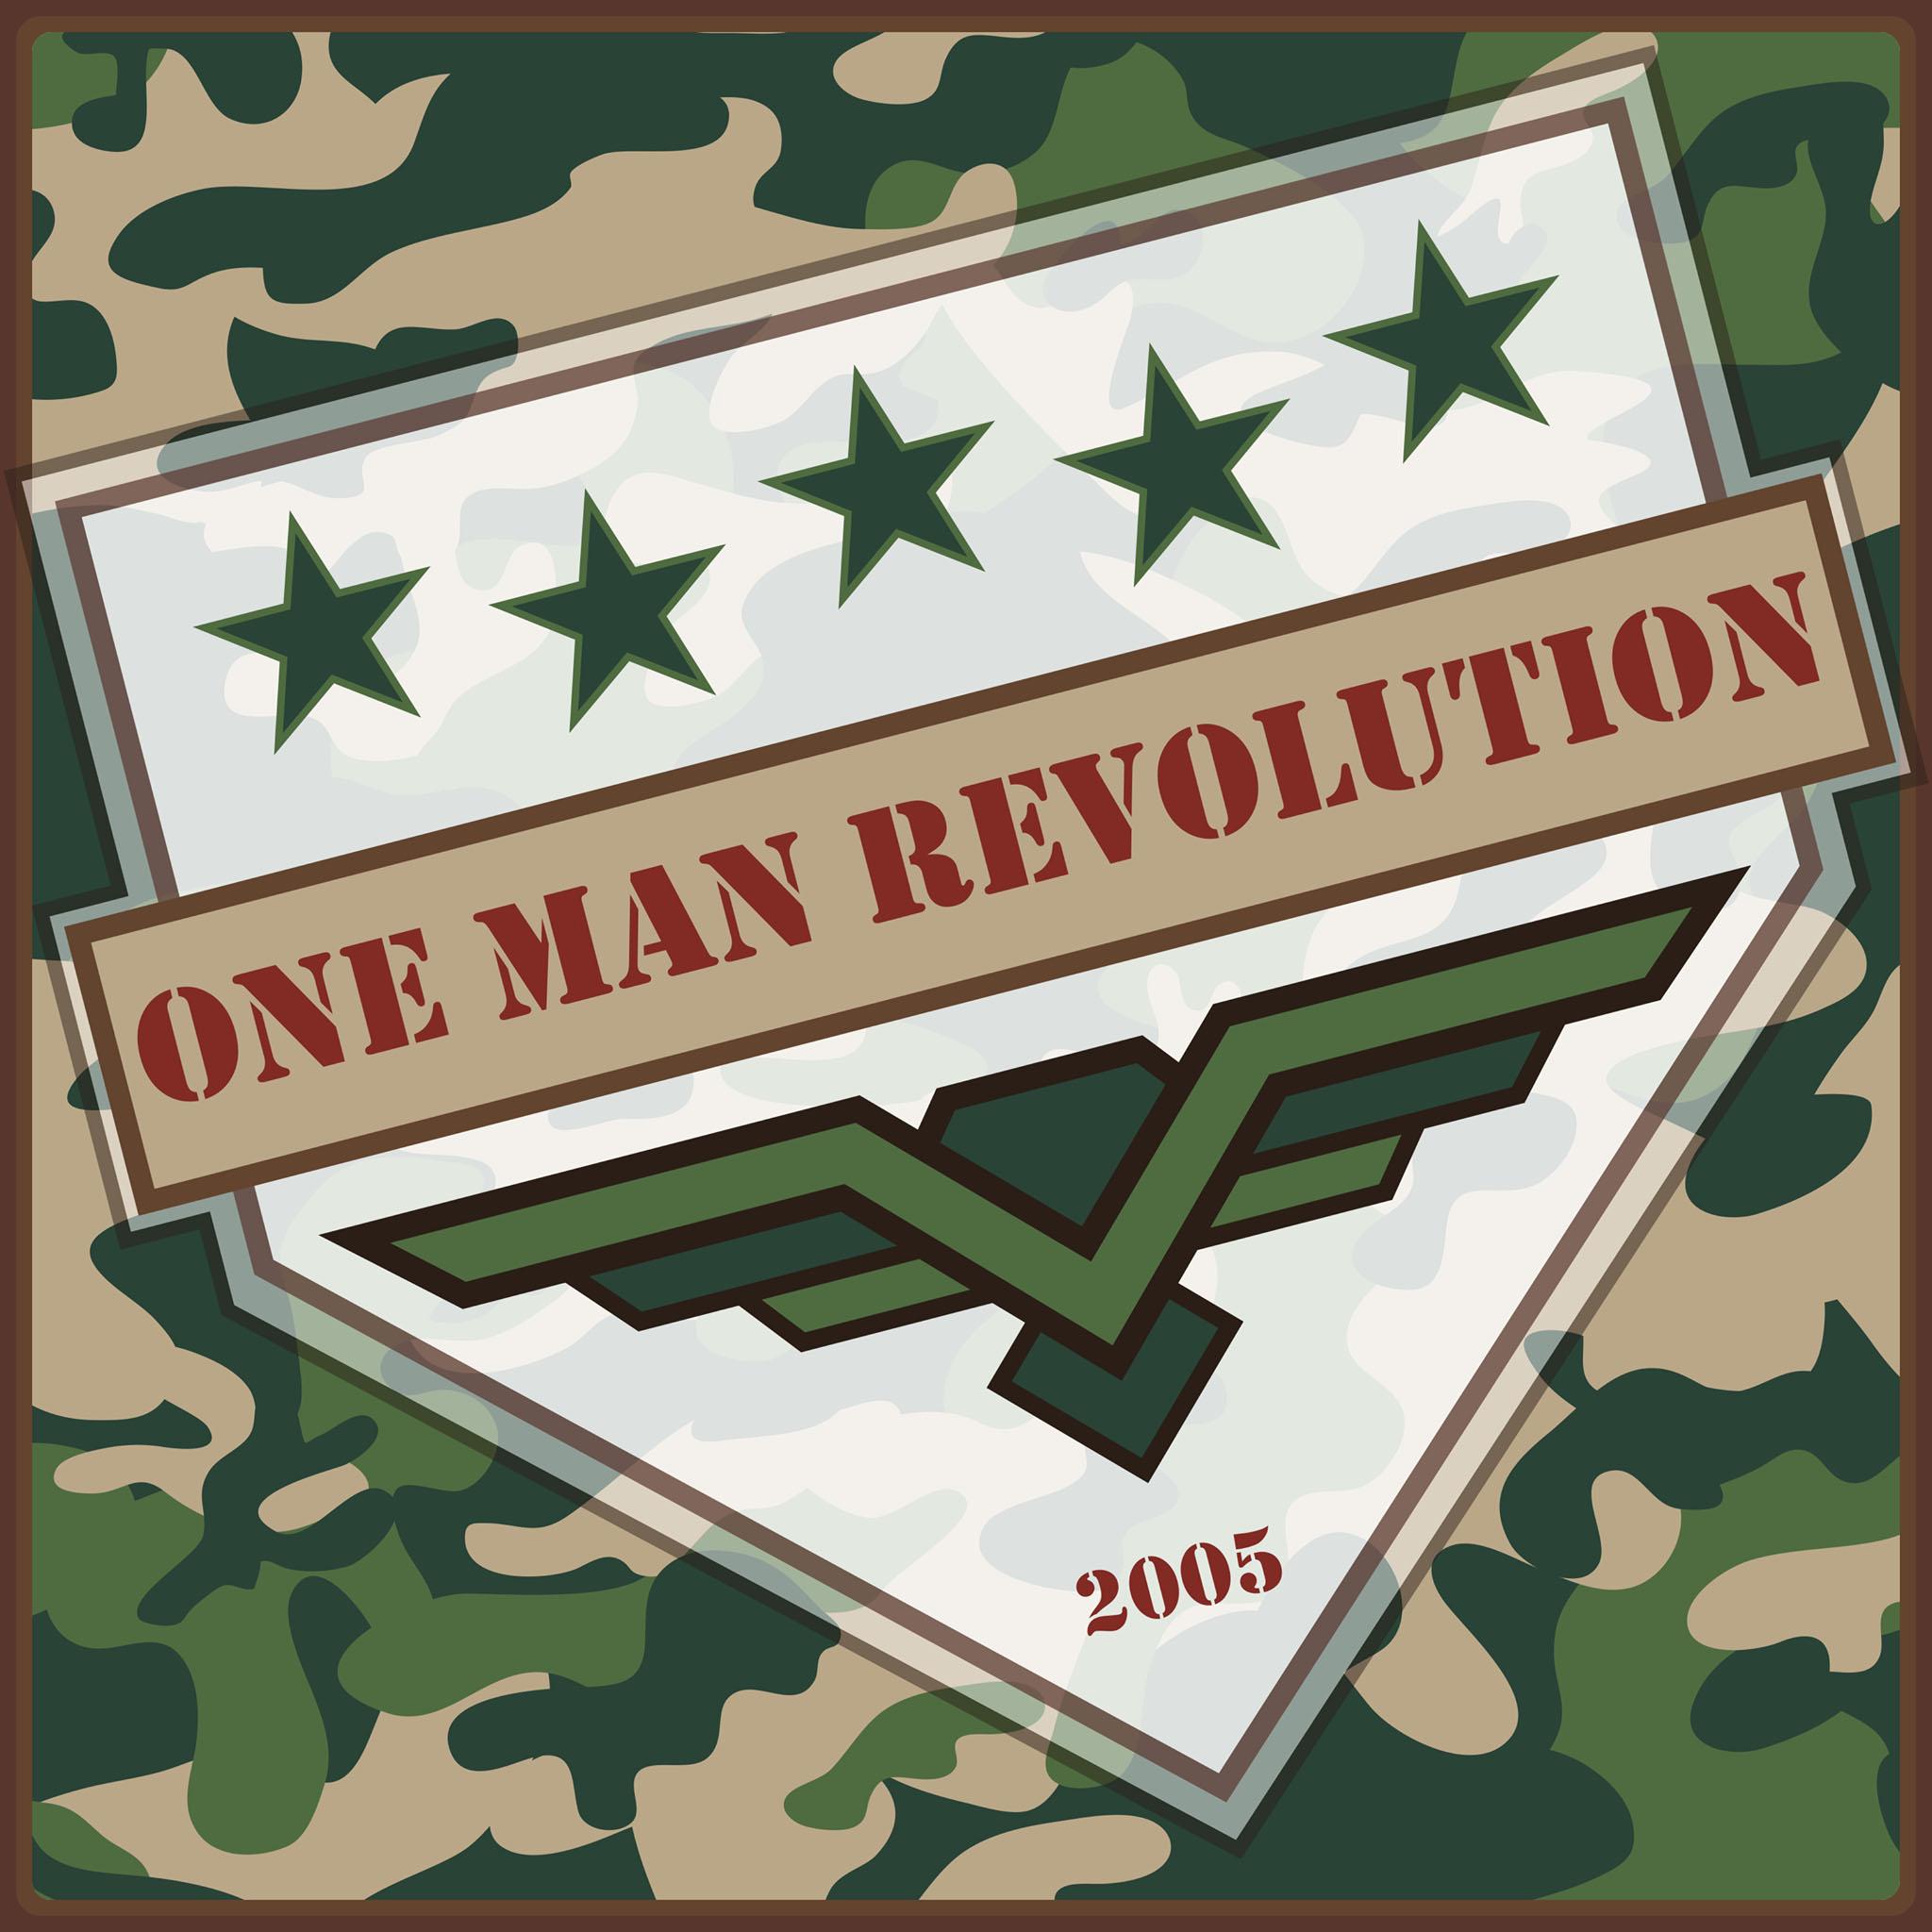 V3E132 - Technokcracy